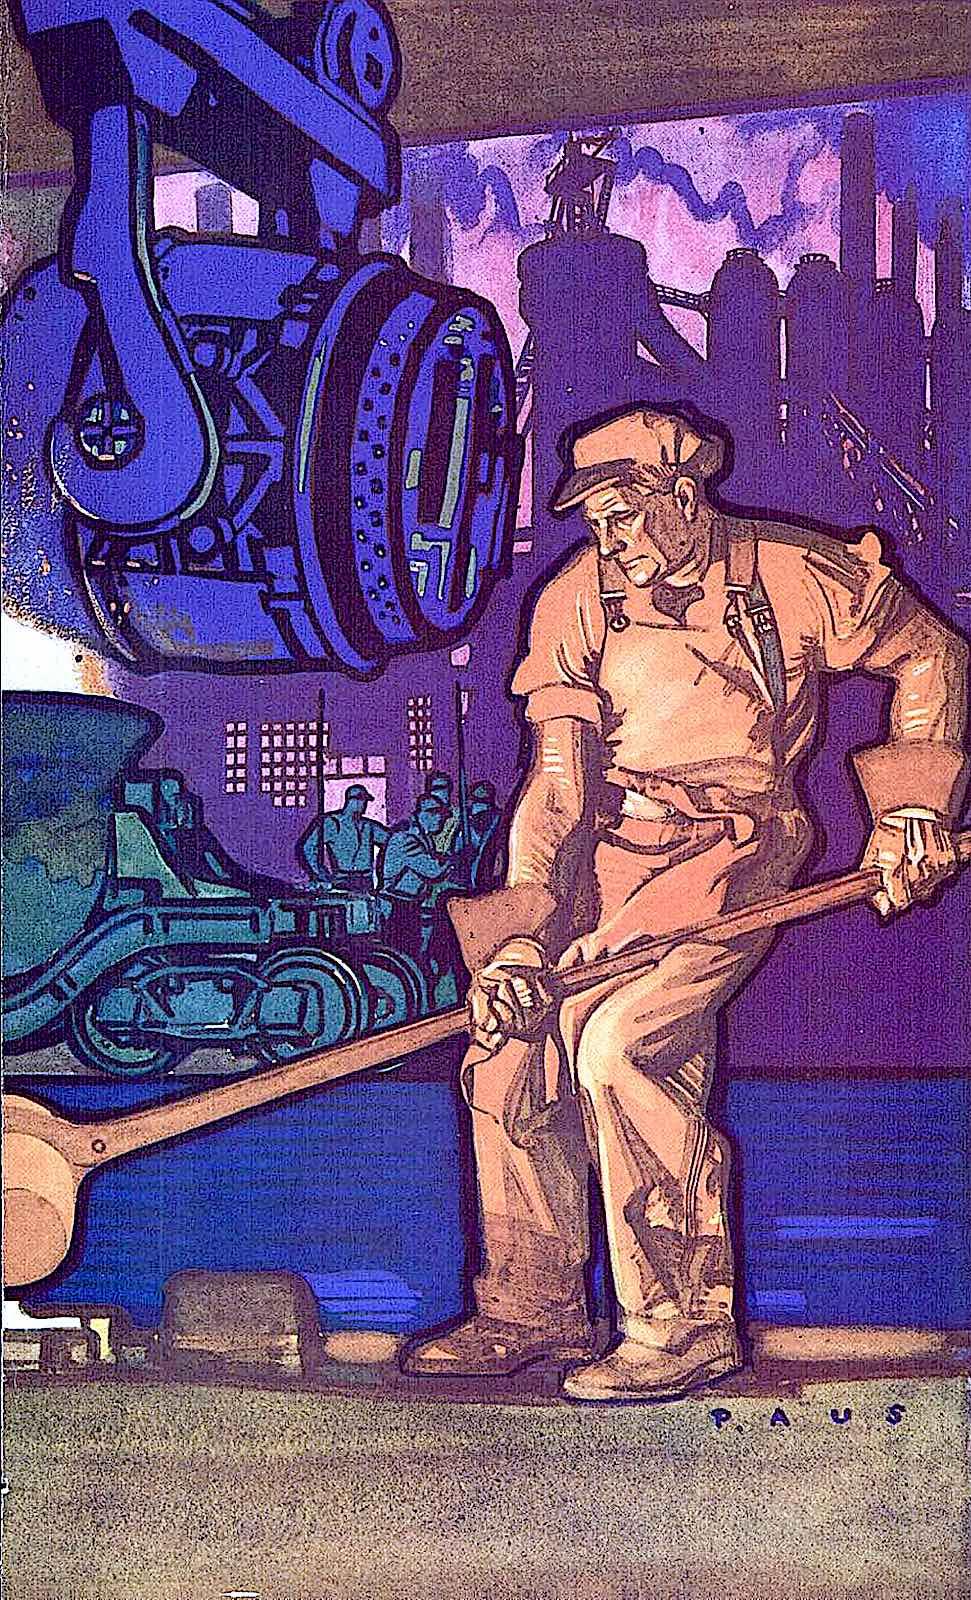 a Herbert Paus 1930 illustration of men in a steel foundry